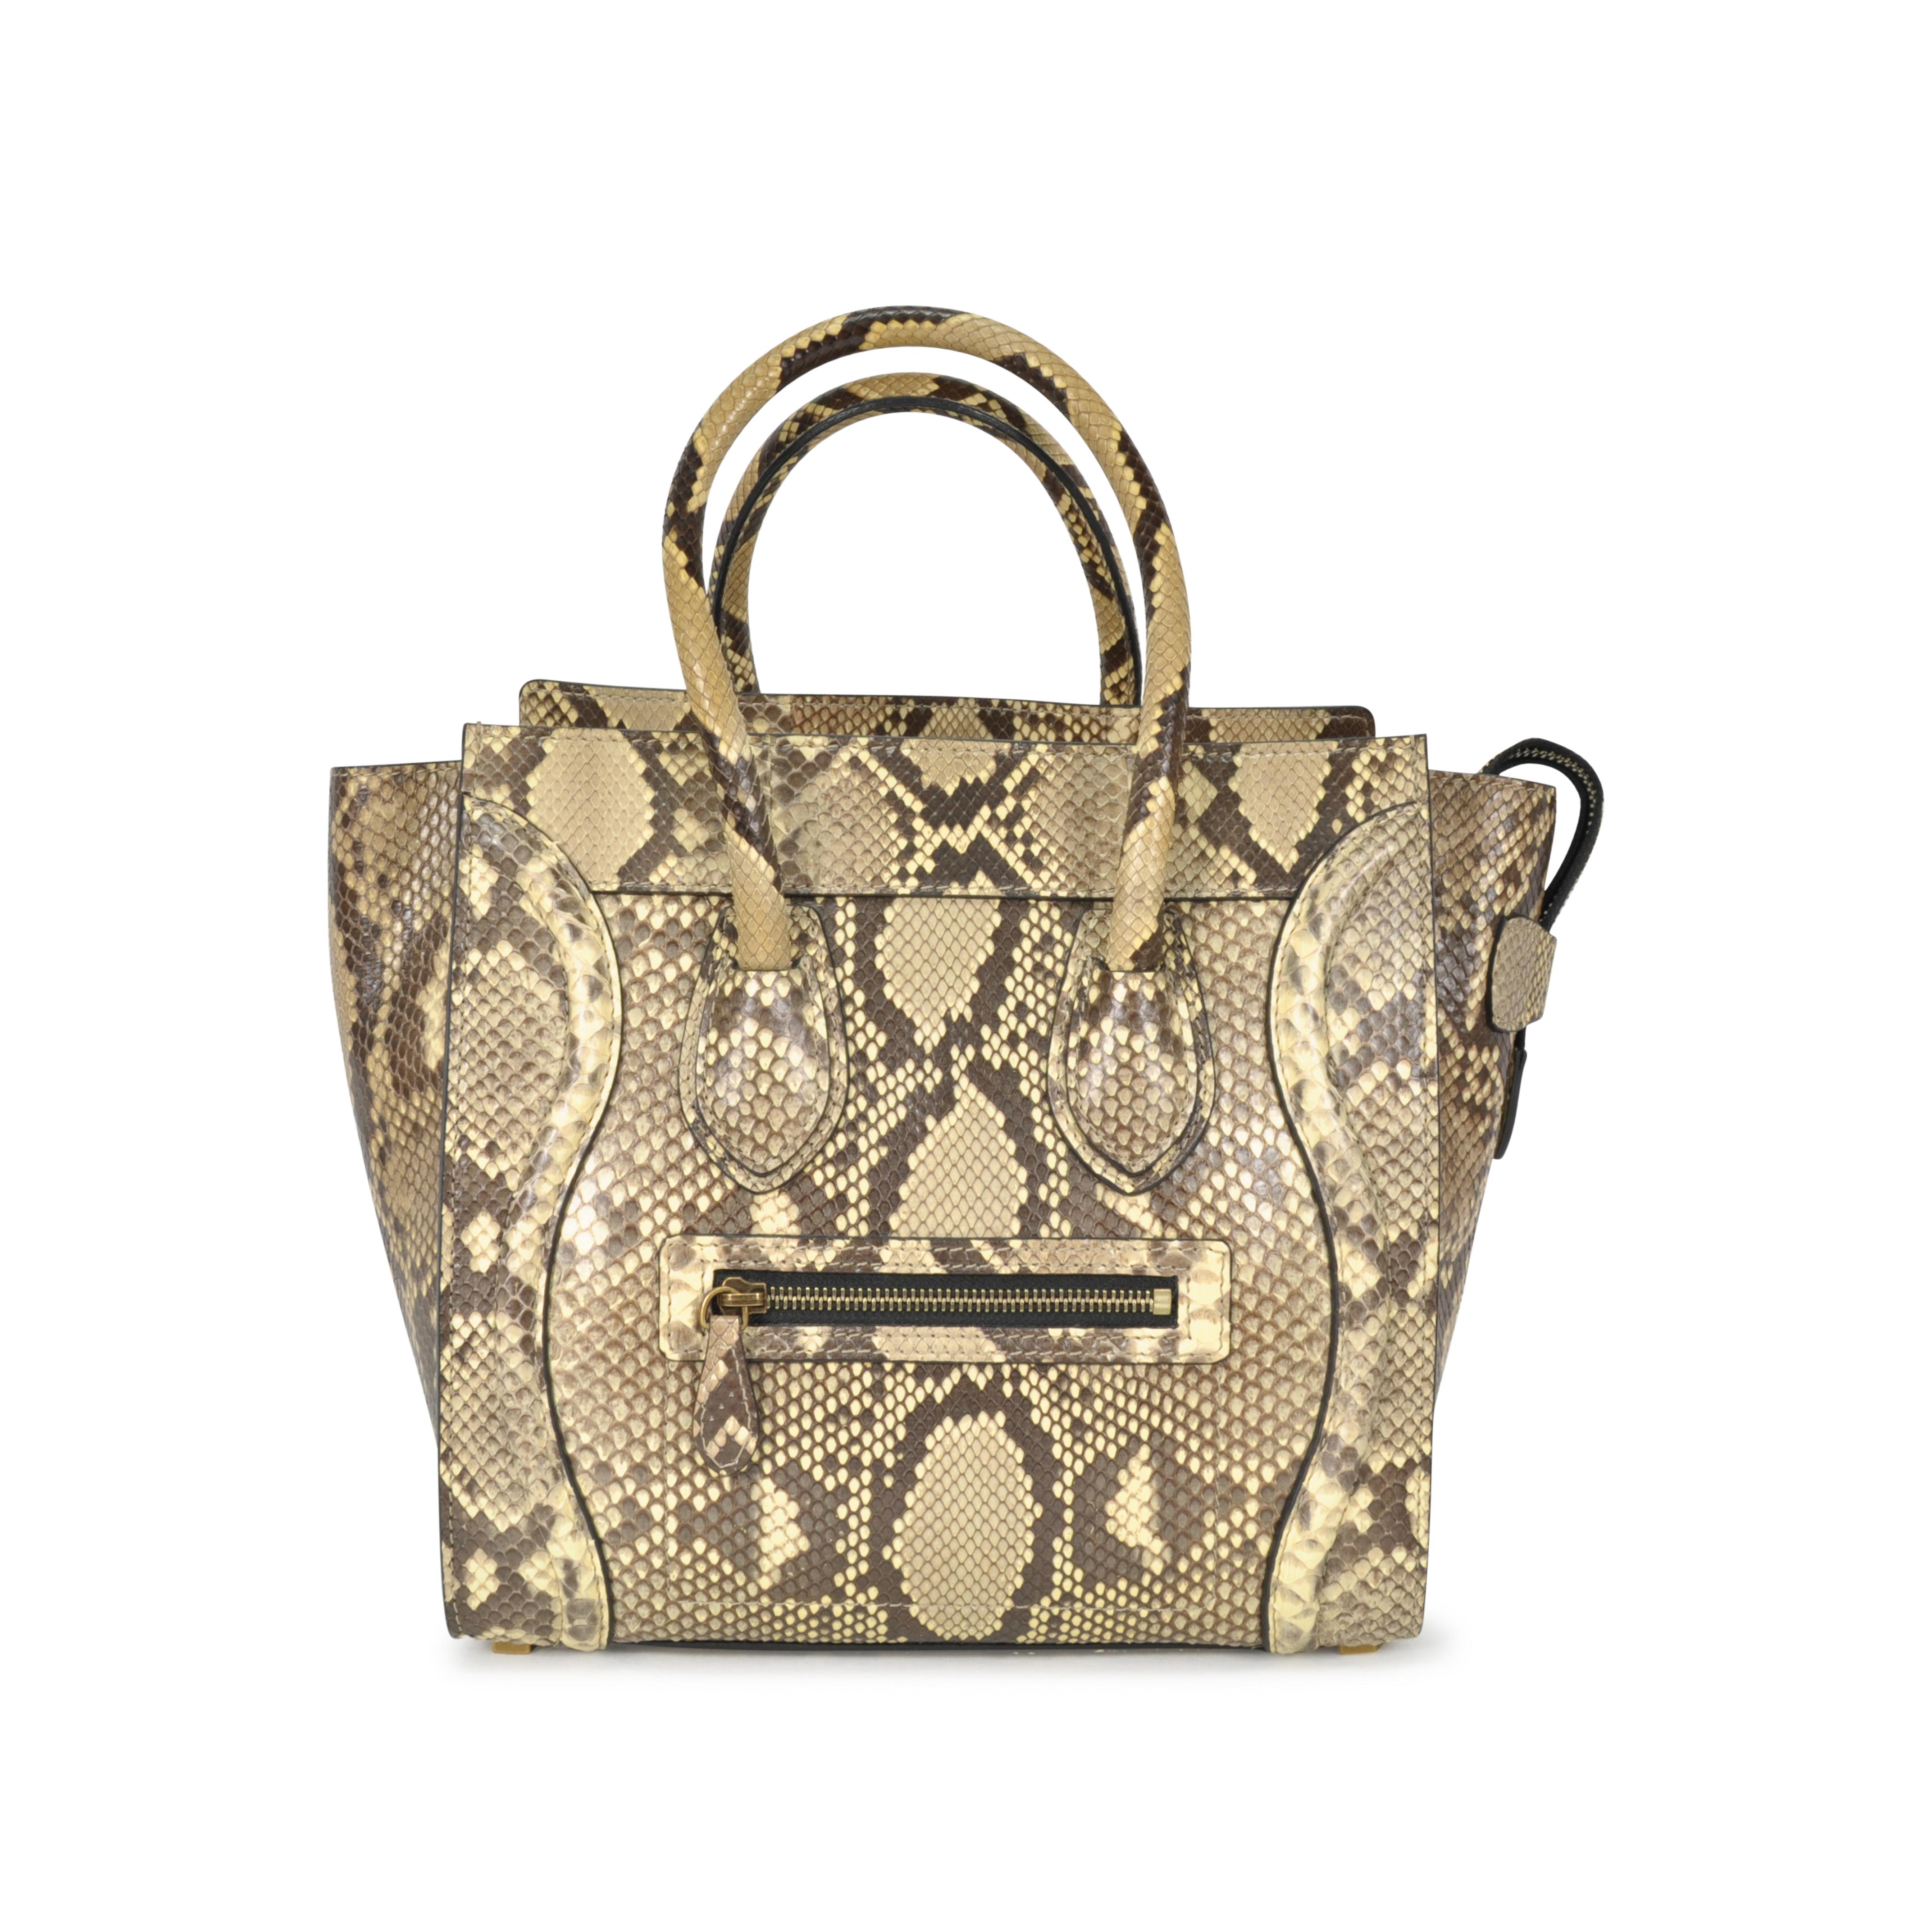 e36925eec2 Authentic Second Hand Céline Python Micro Luggage Bag (PSS-051-00047 ...